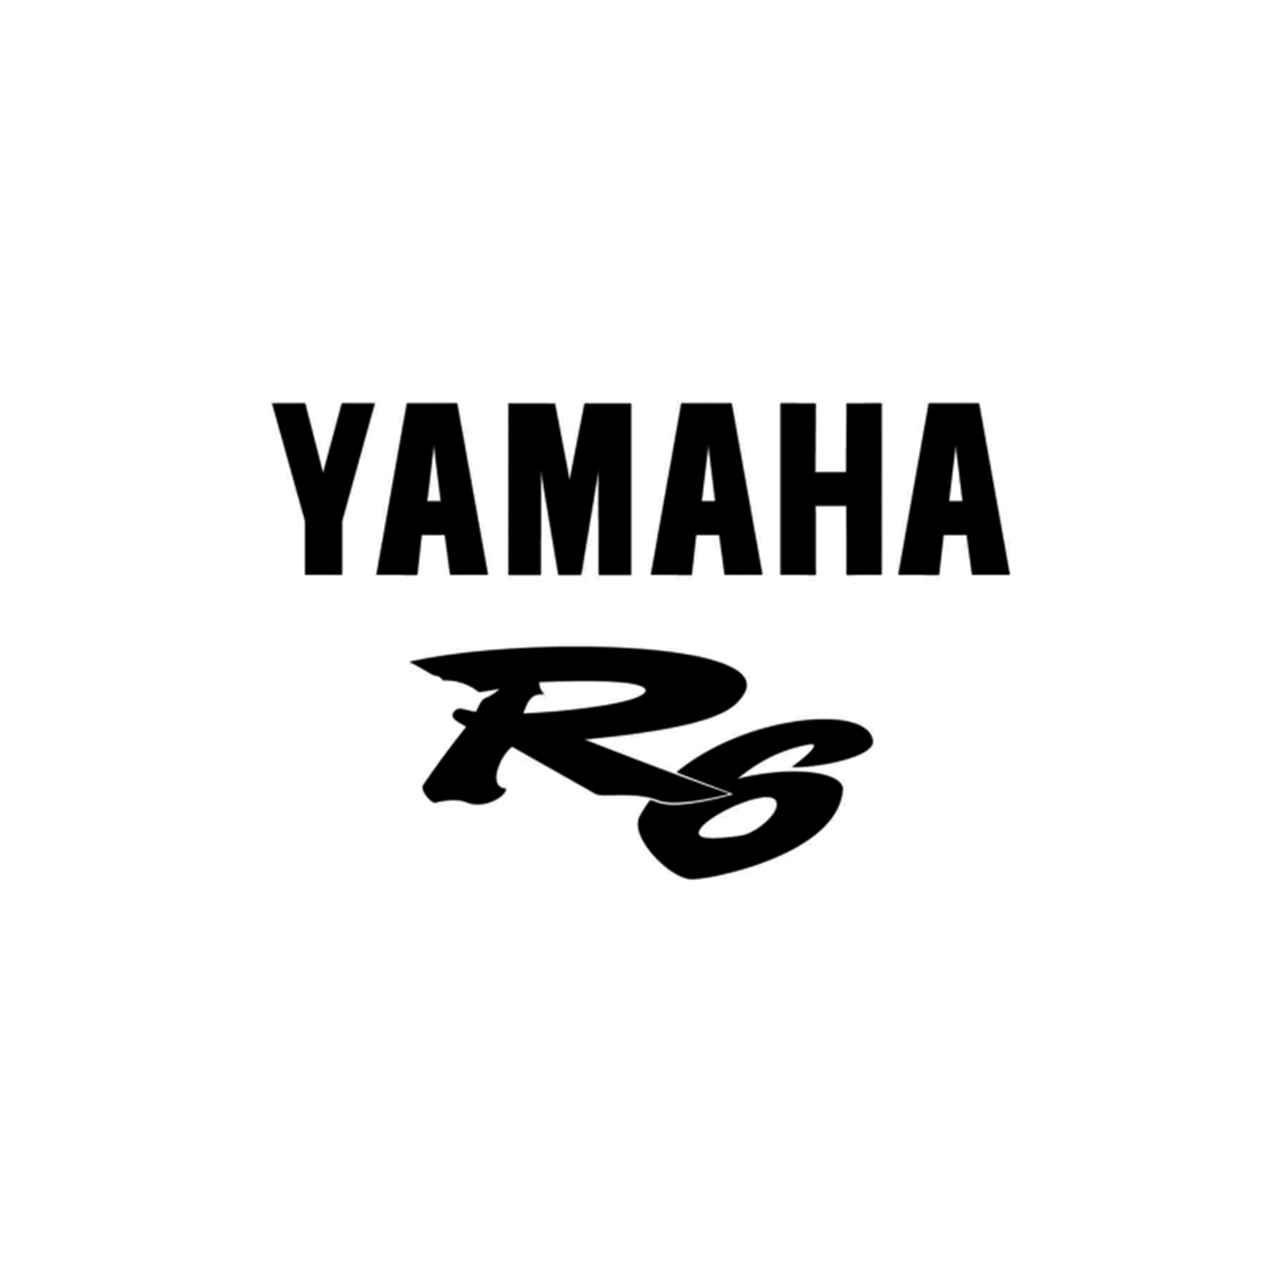 Yamaha R6 Logo Vinyl Decal Sticker